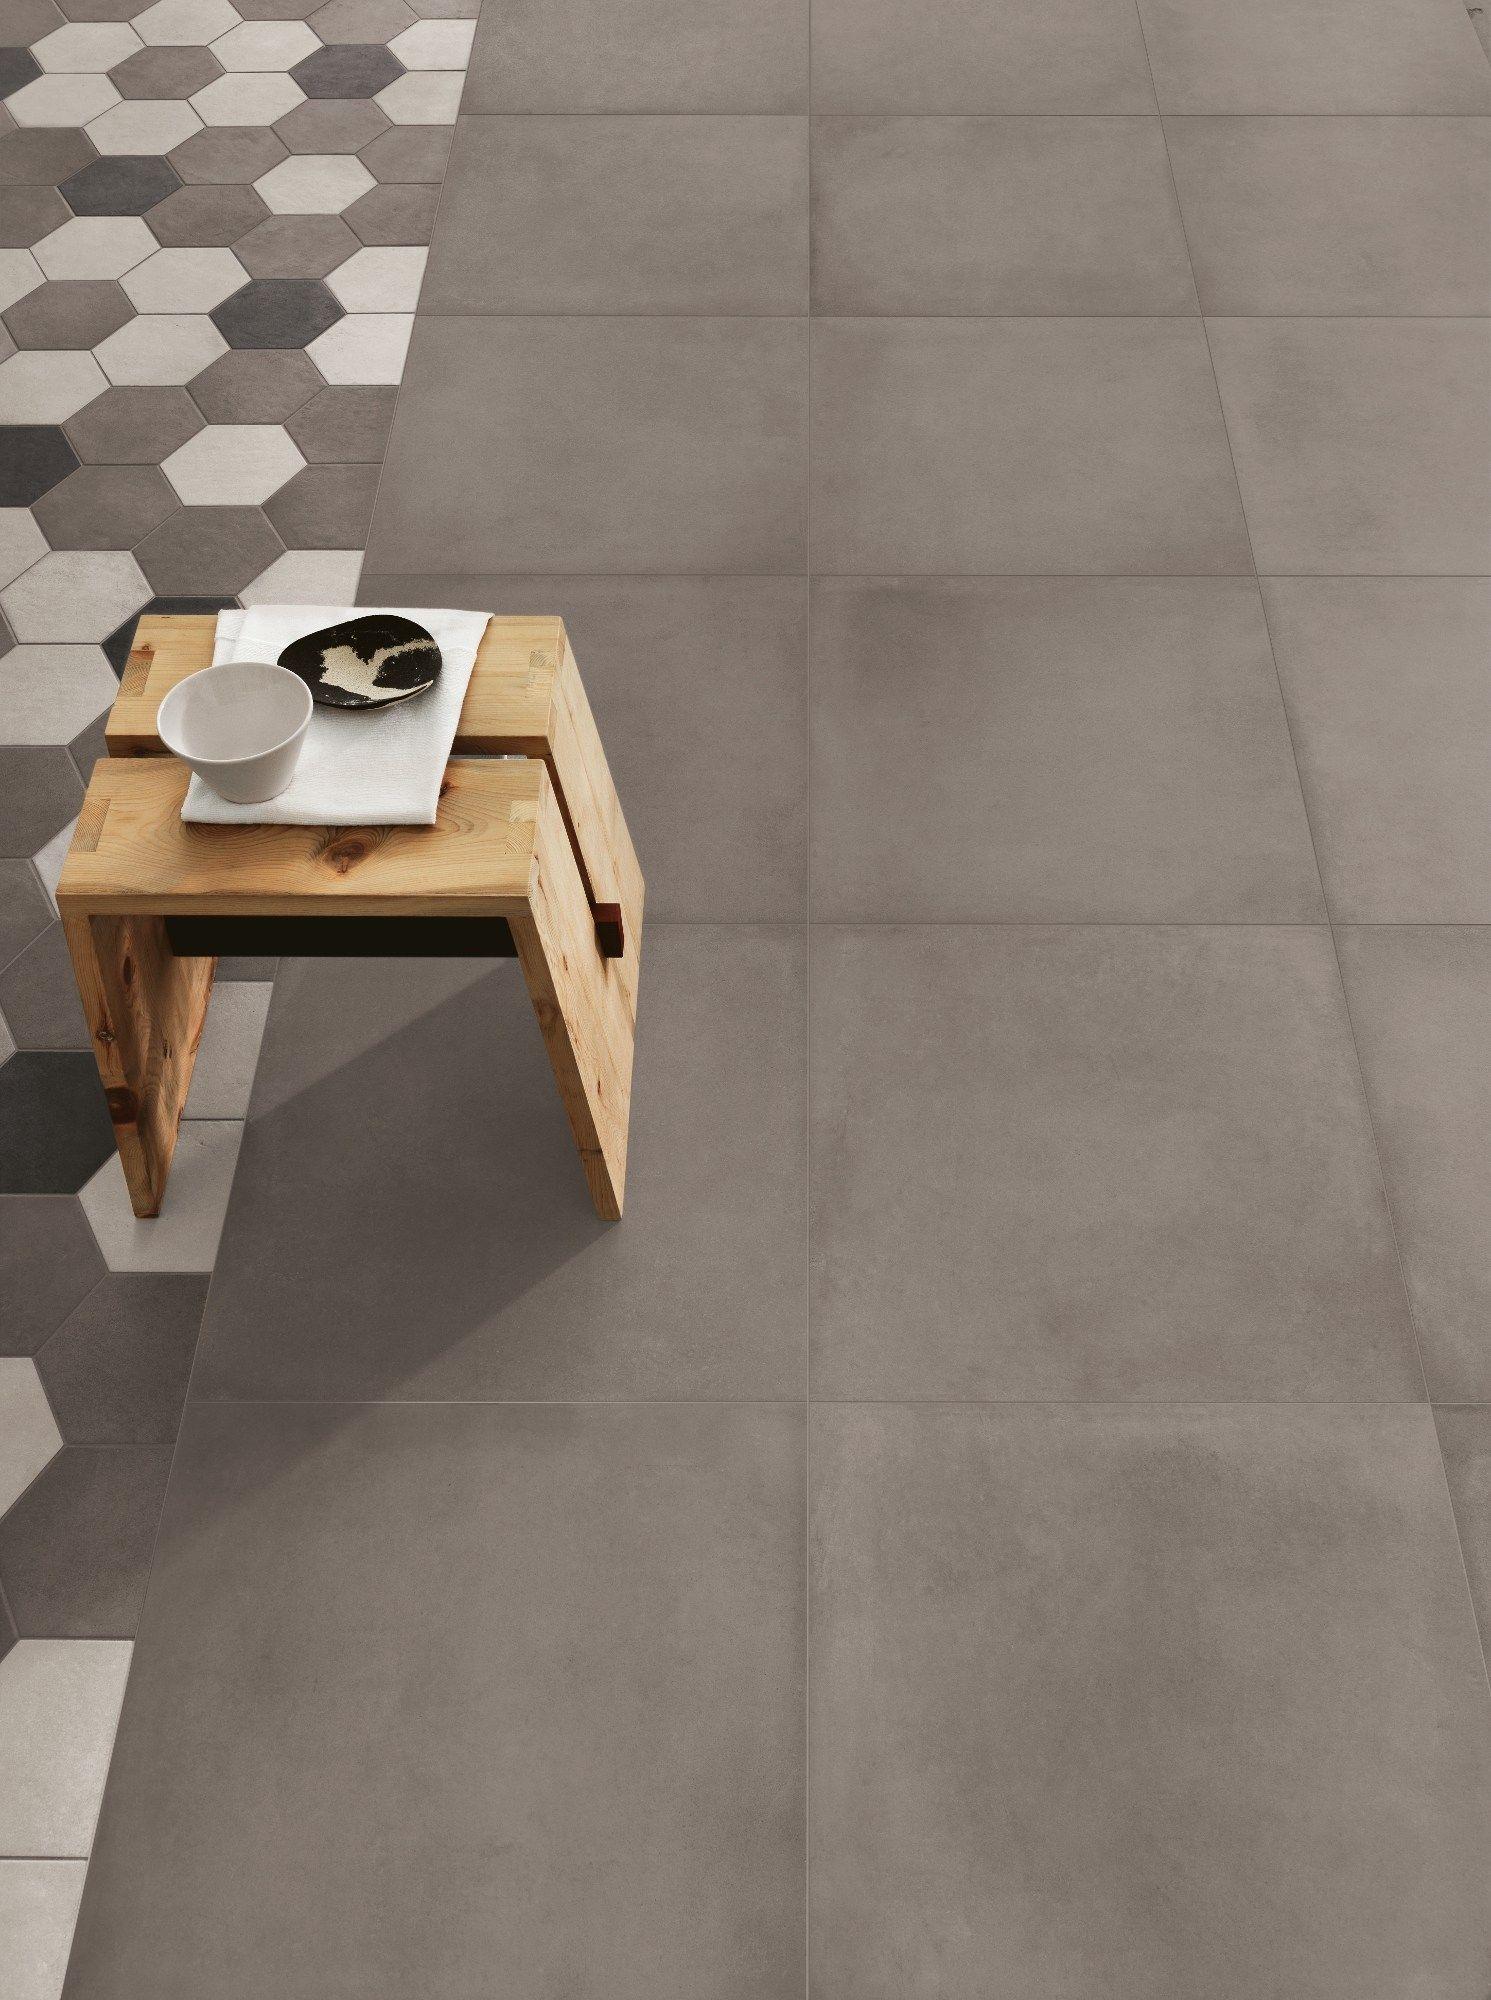 Porcelain stoneware wallfloor tiles rewind by ragno marazzi porcelain stoneware wallfloor tiles rewind by ragno marazzi group dailygadgetfo Choice Image